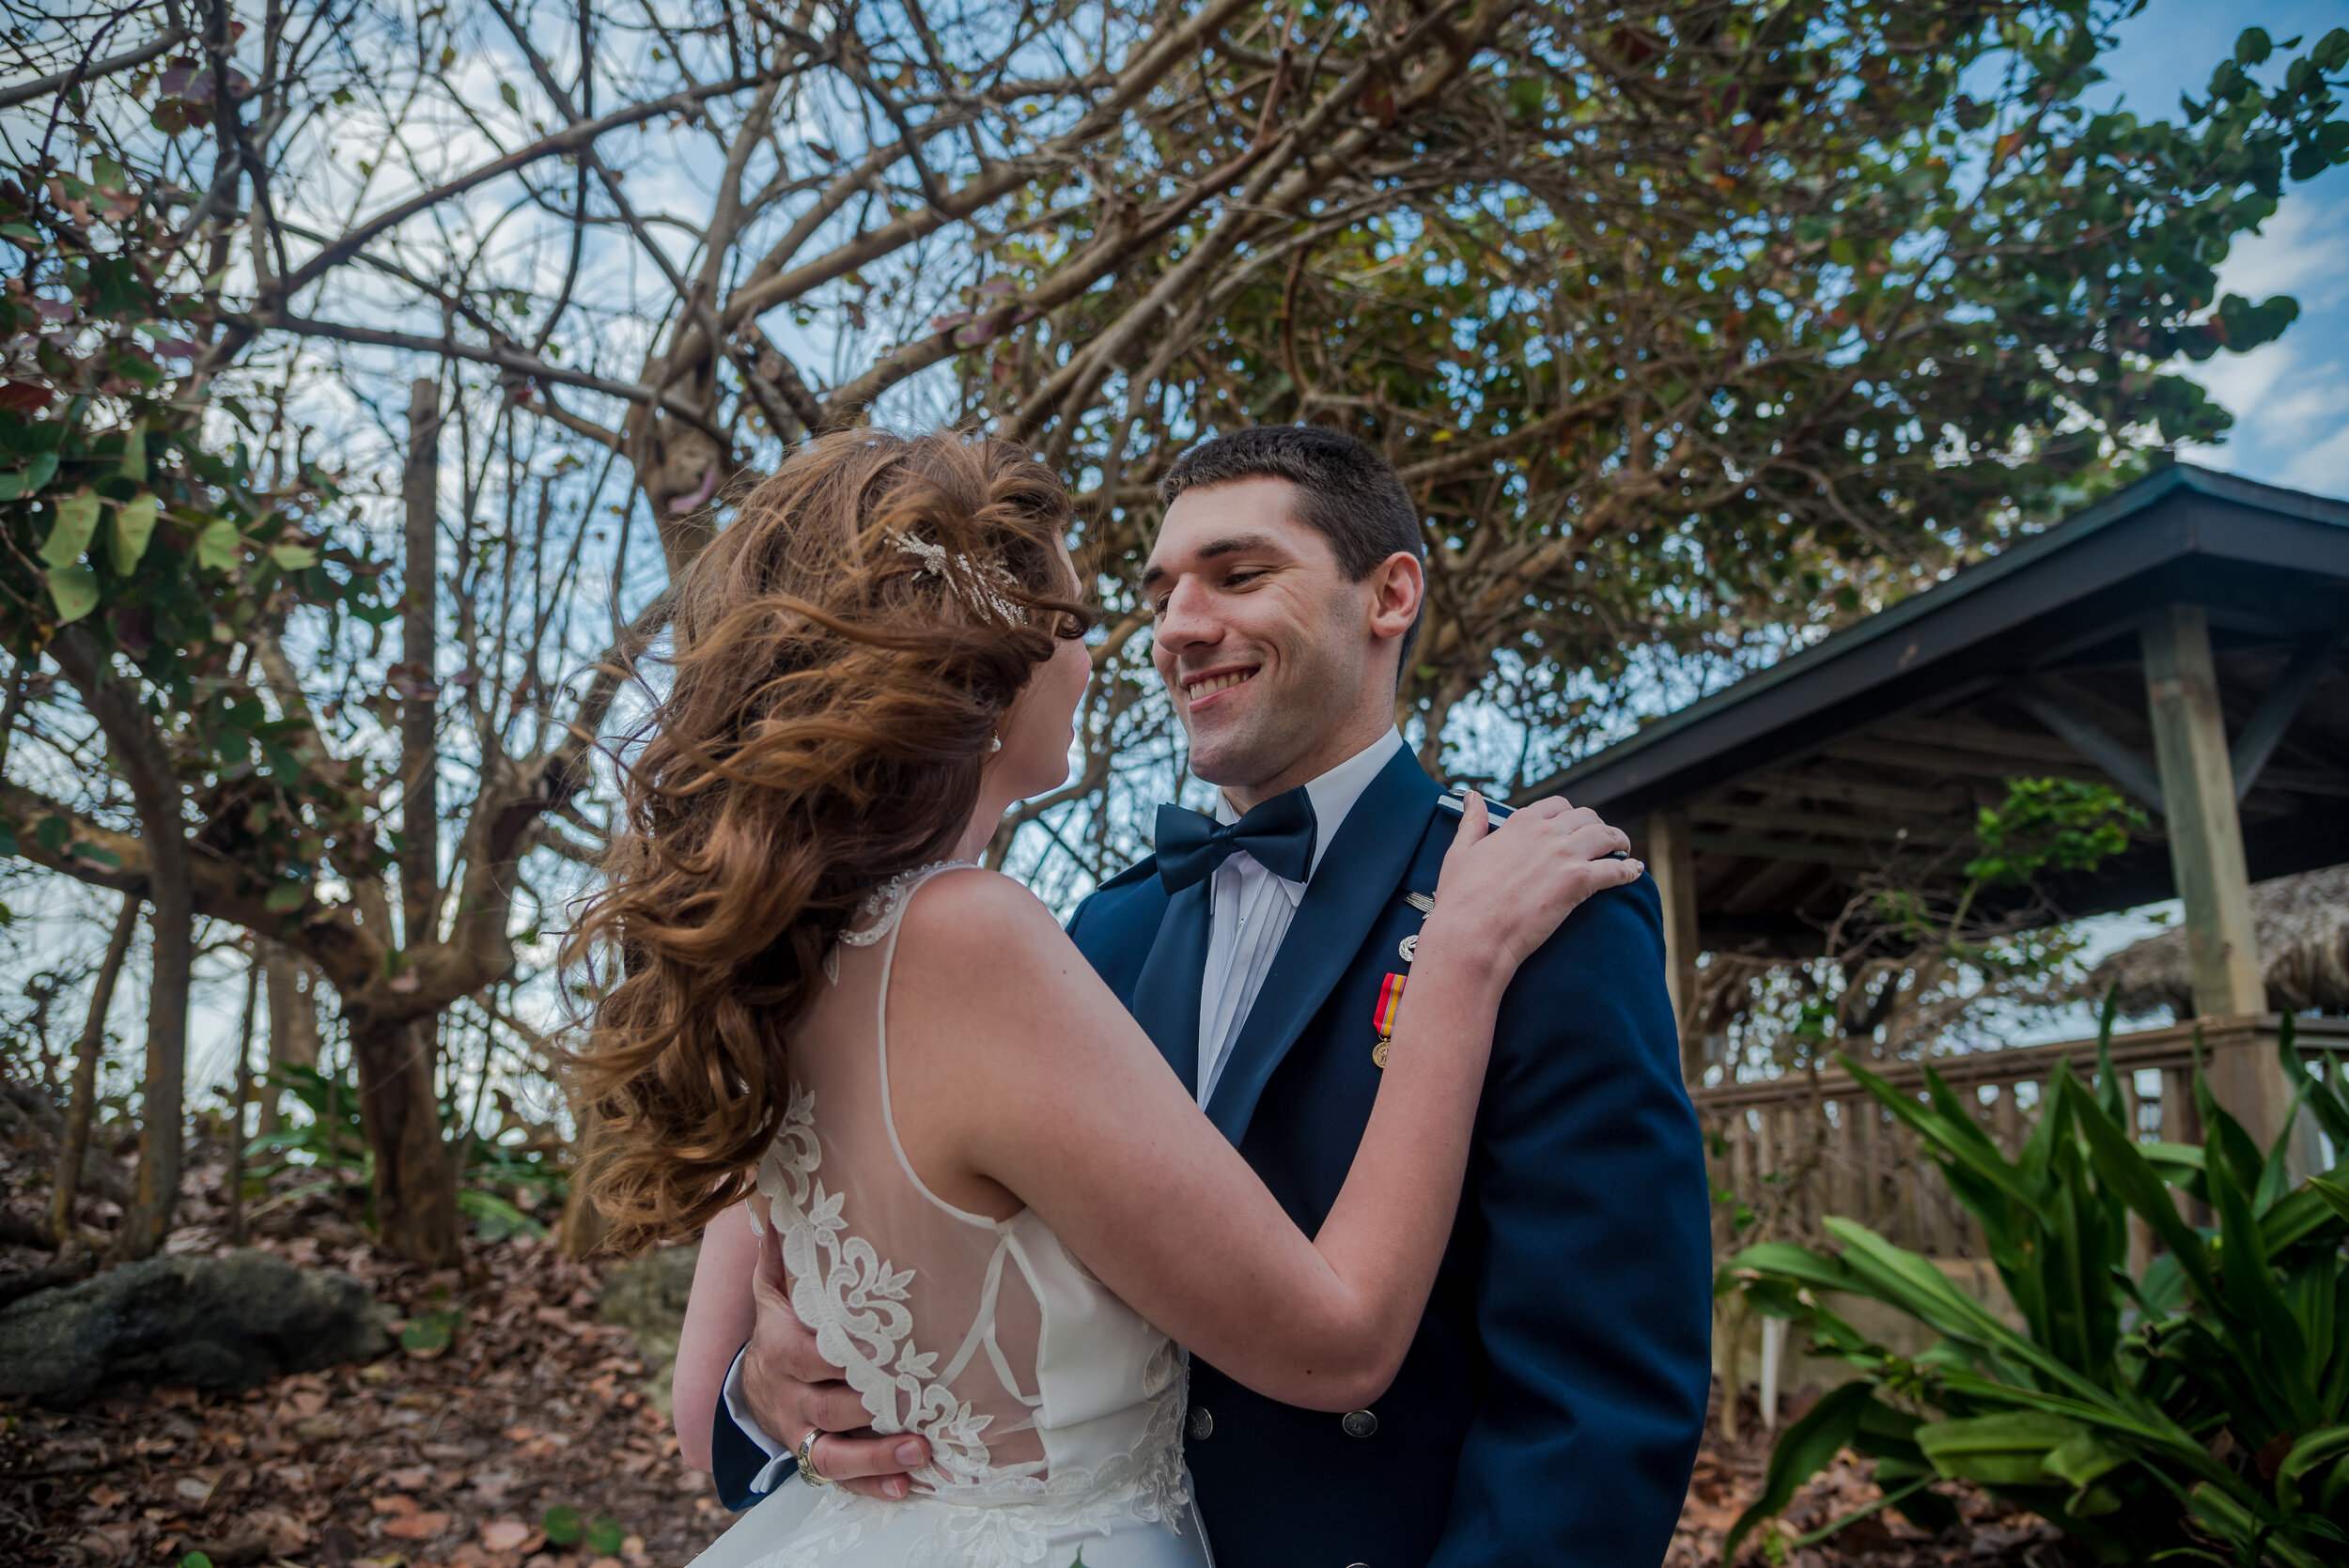 andru-the-tide-club-air-force-wedding-patrickafb-1-18.jpg